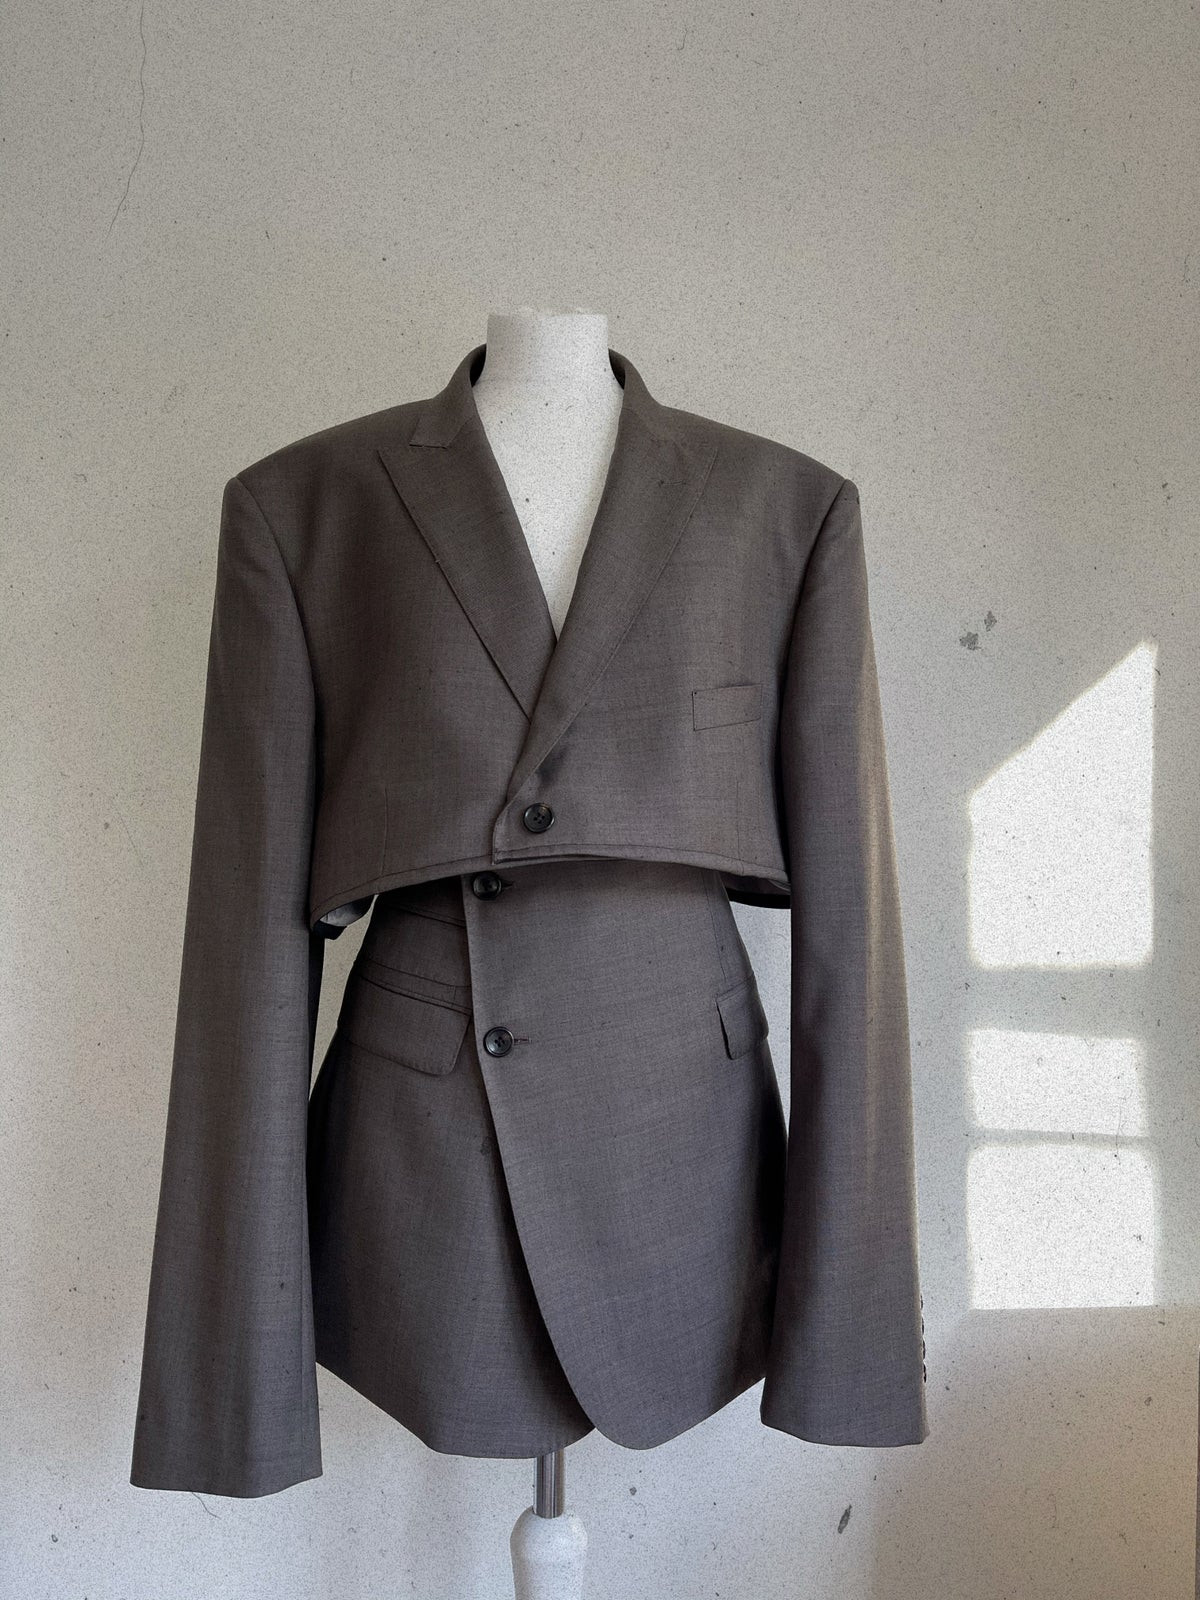 Reworked Grey Suit